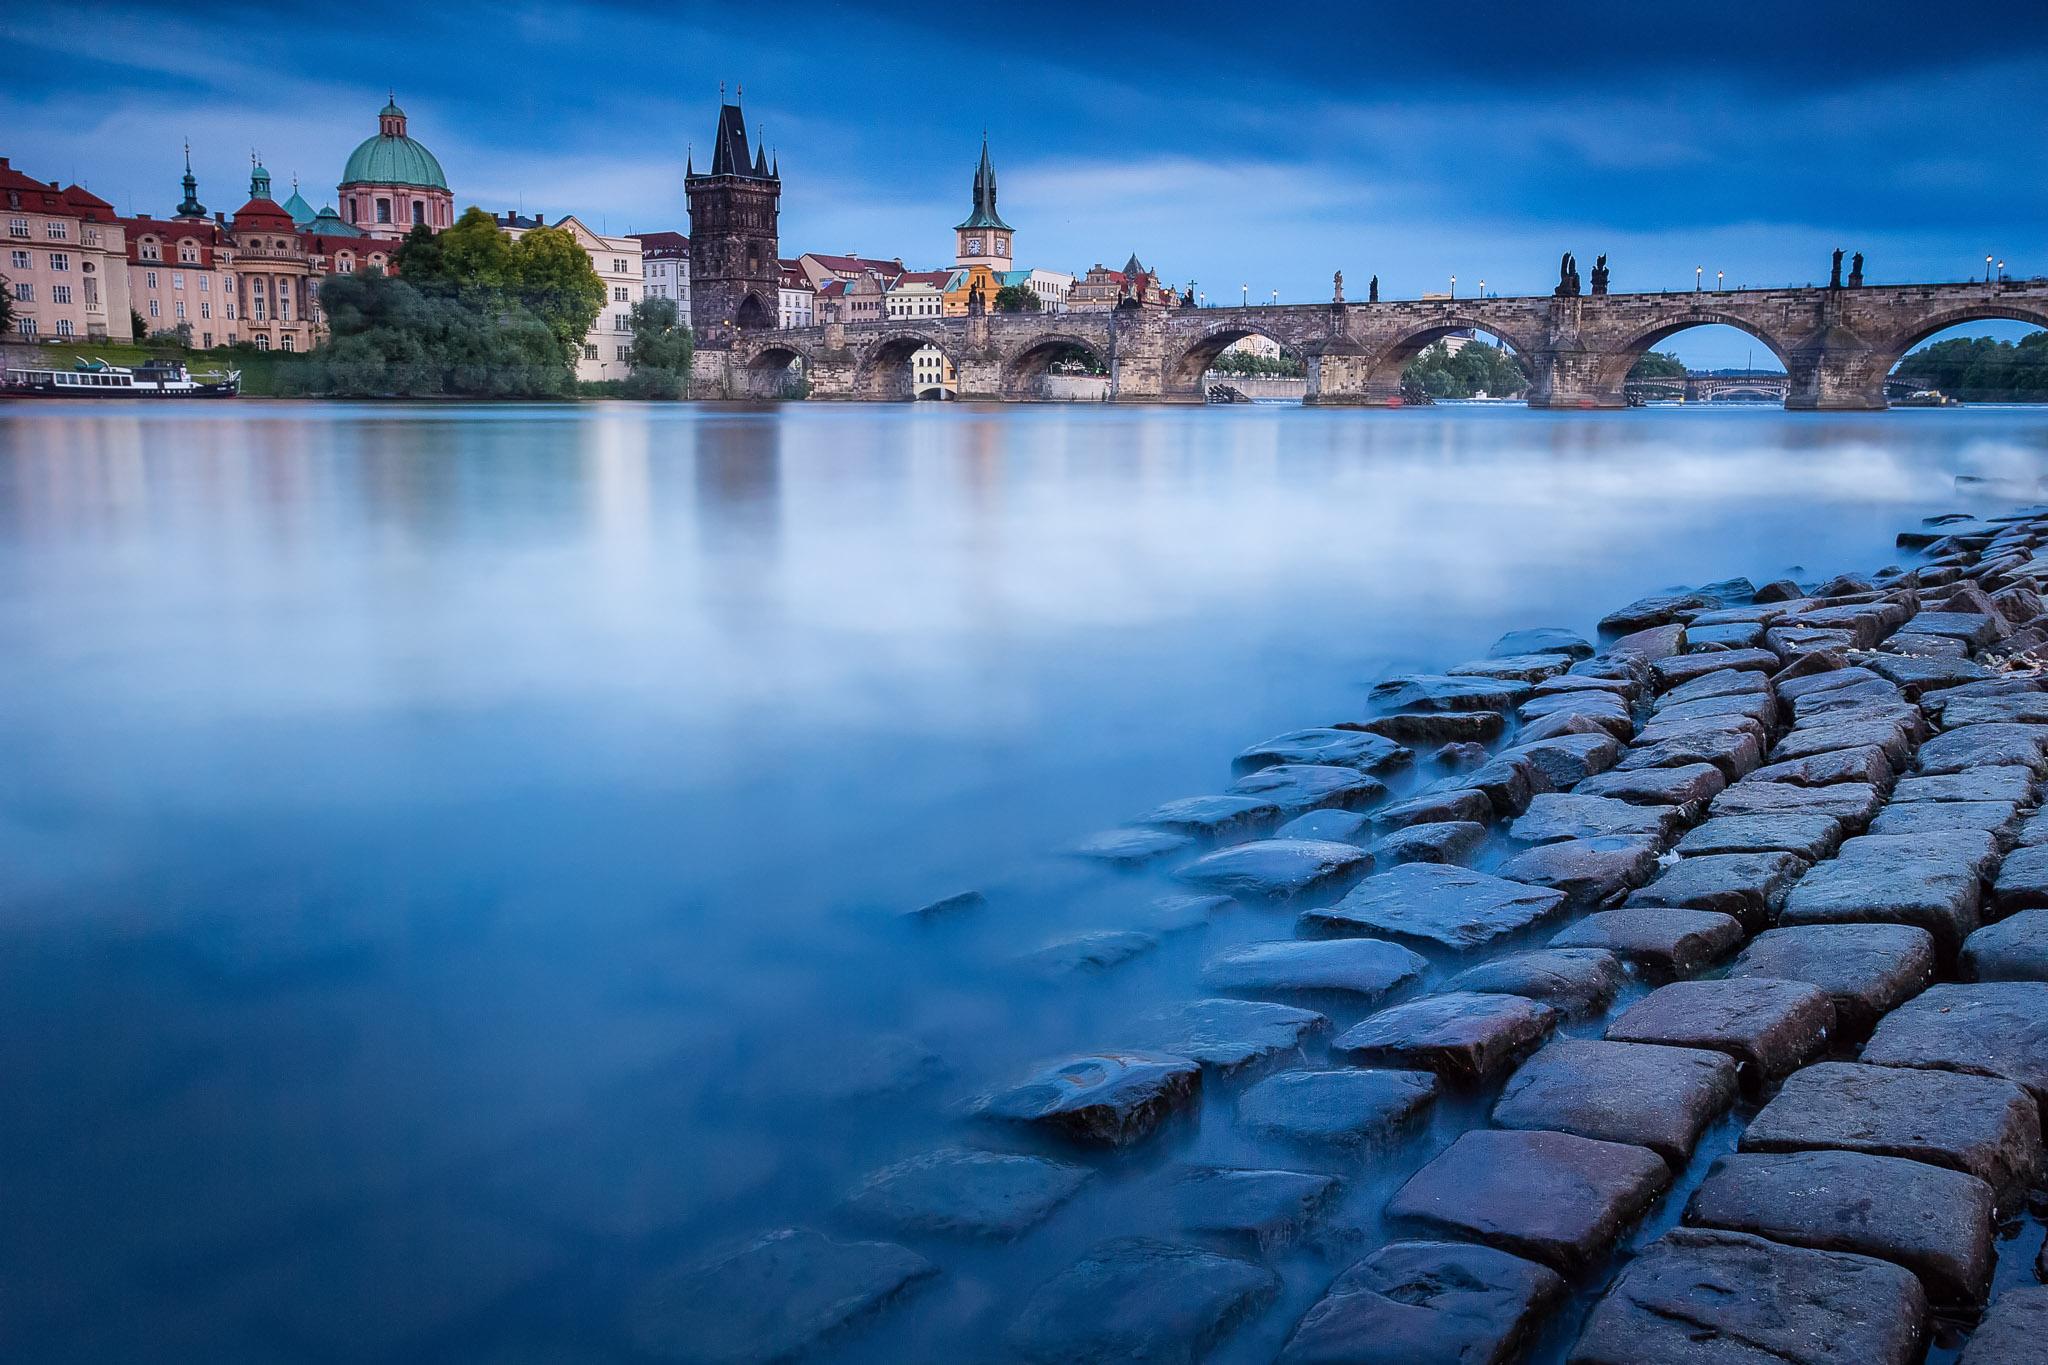 Charles bridge in historical Prague after sunset